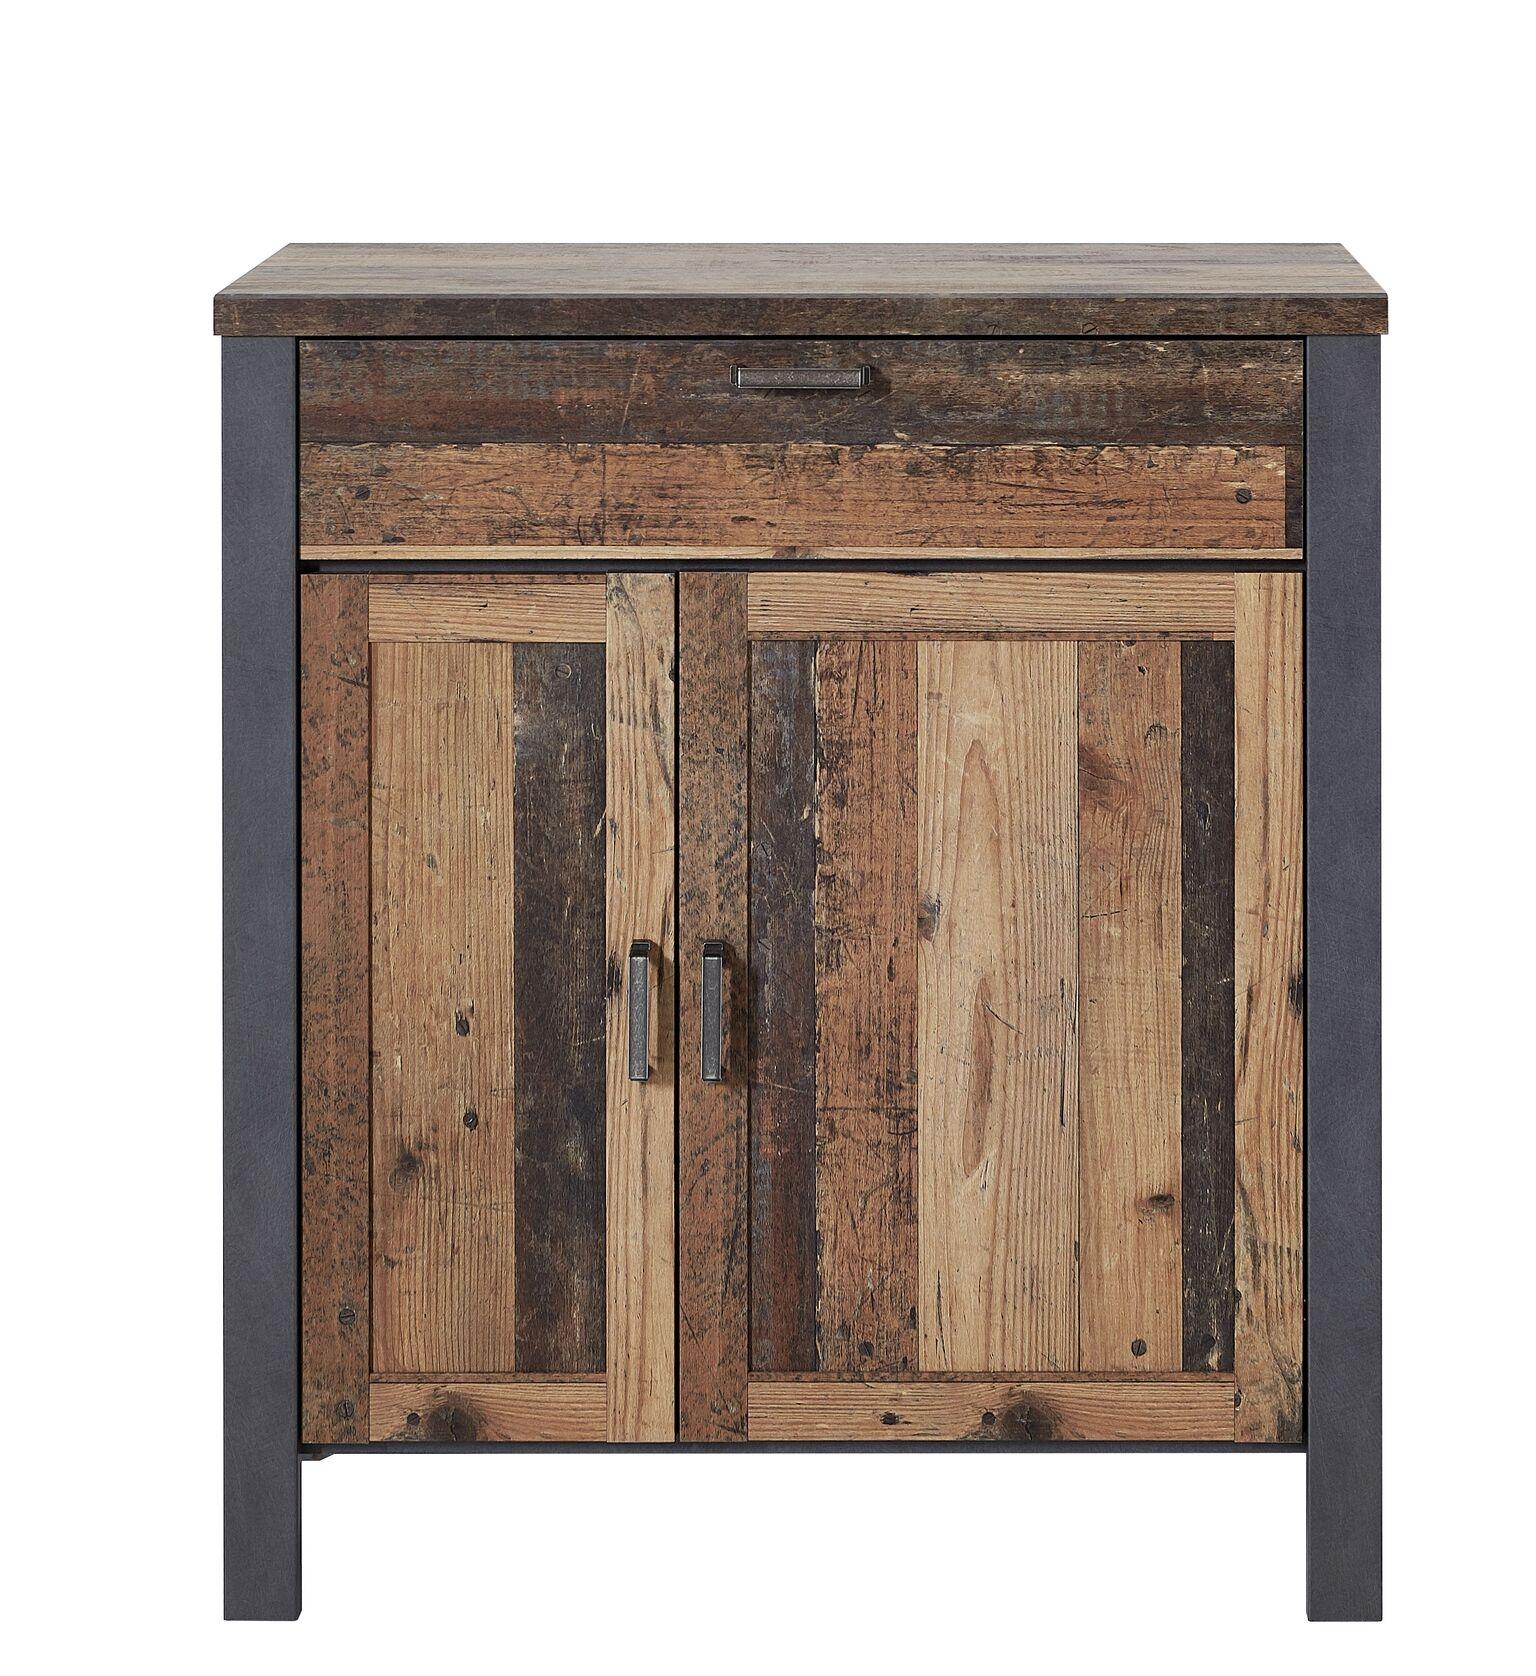 Cabinet din pal cu 2 usi si 1 sertar Chelsea Natural / Grafit, l94xA40xH105 cm imagine